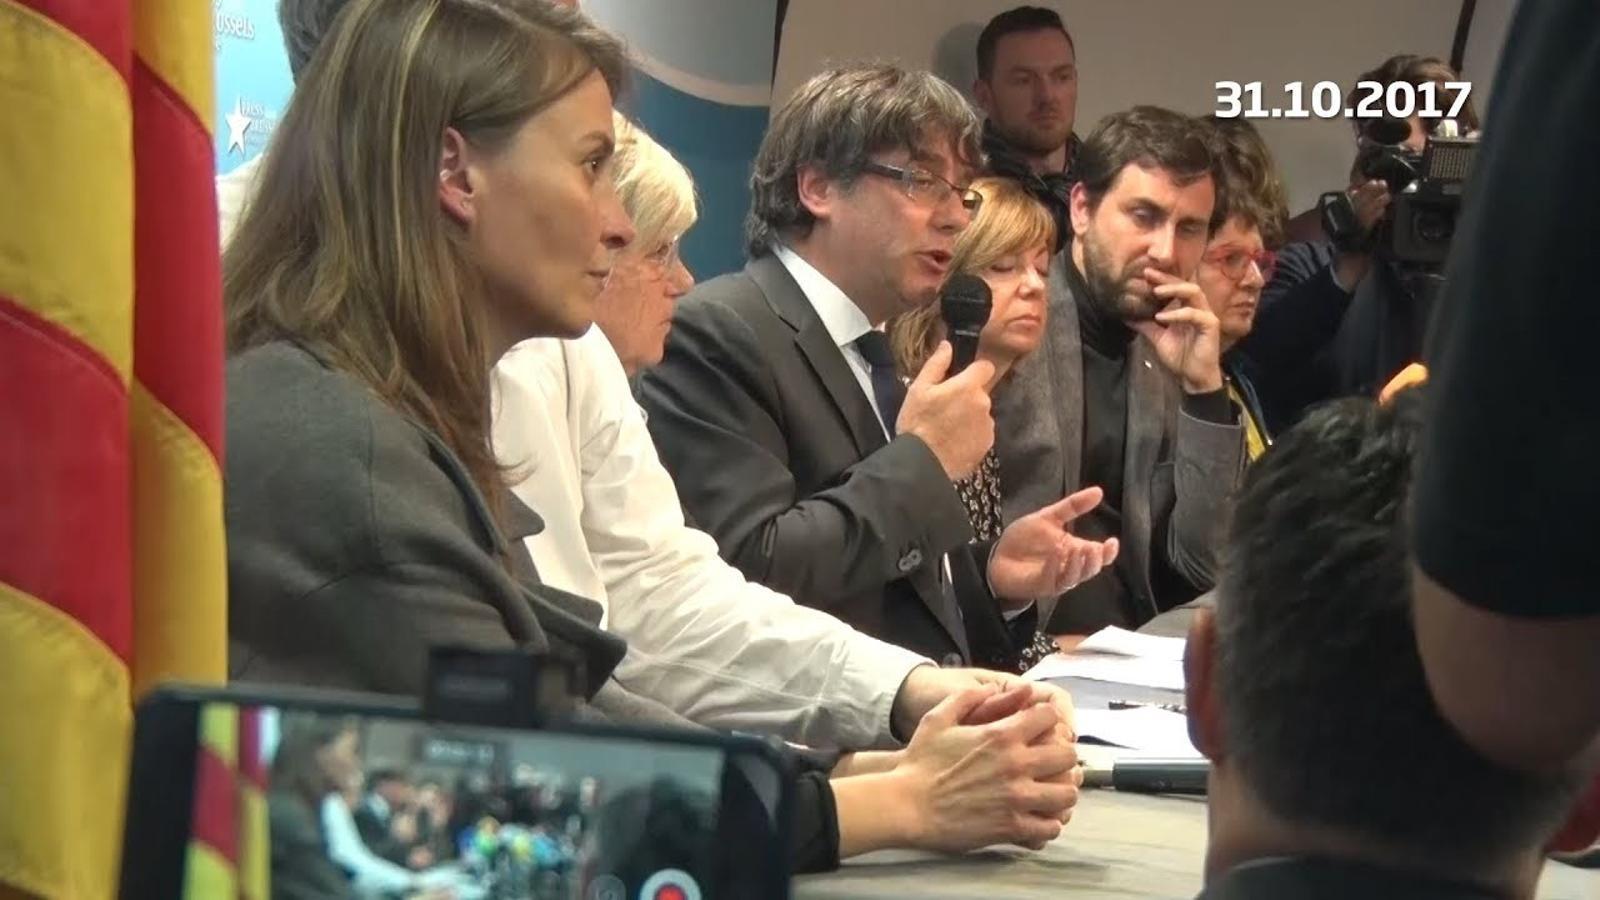 Carles Puigdemont compareix a Brussel·les acompanyat d'alguns consellers